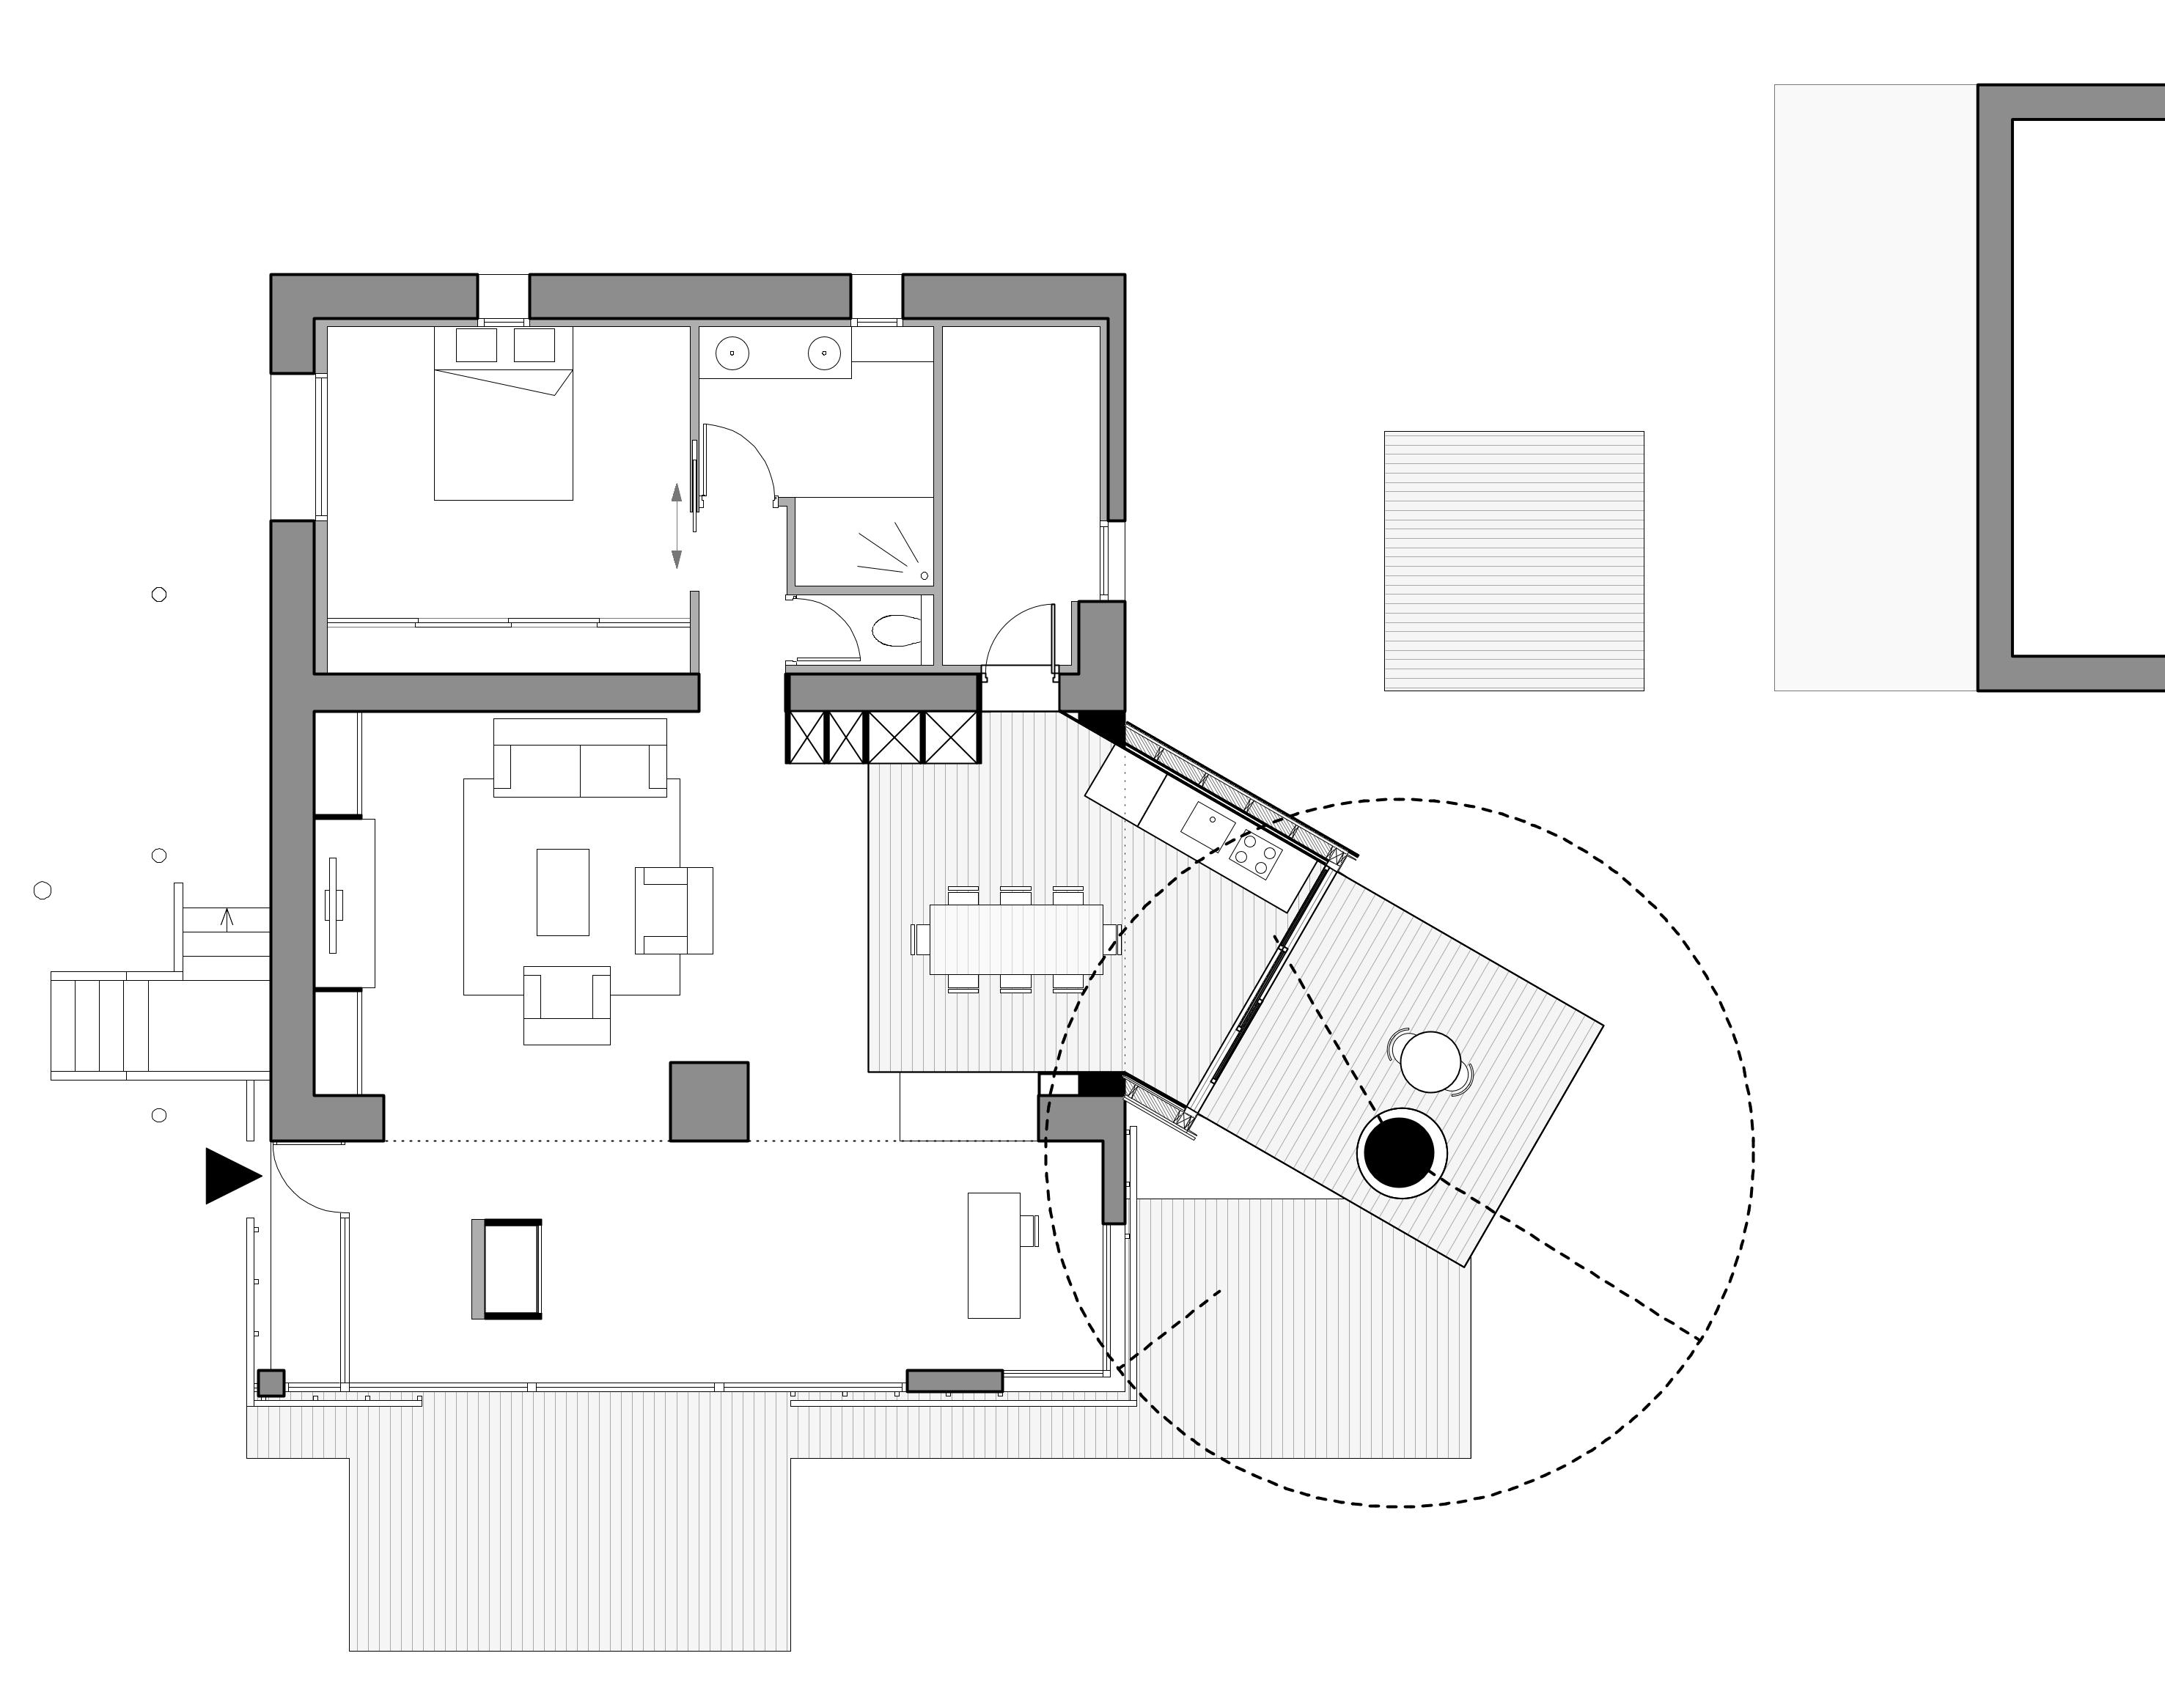 christophe-benichou-architectures-extension-a-06